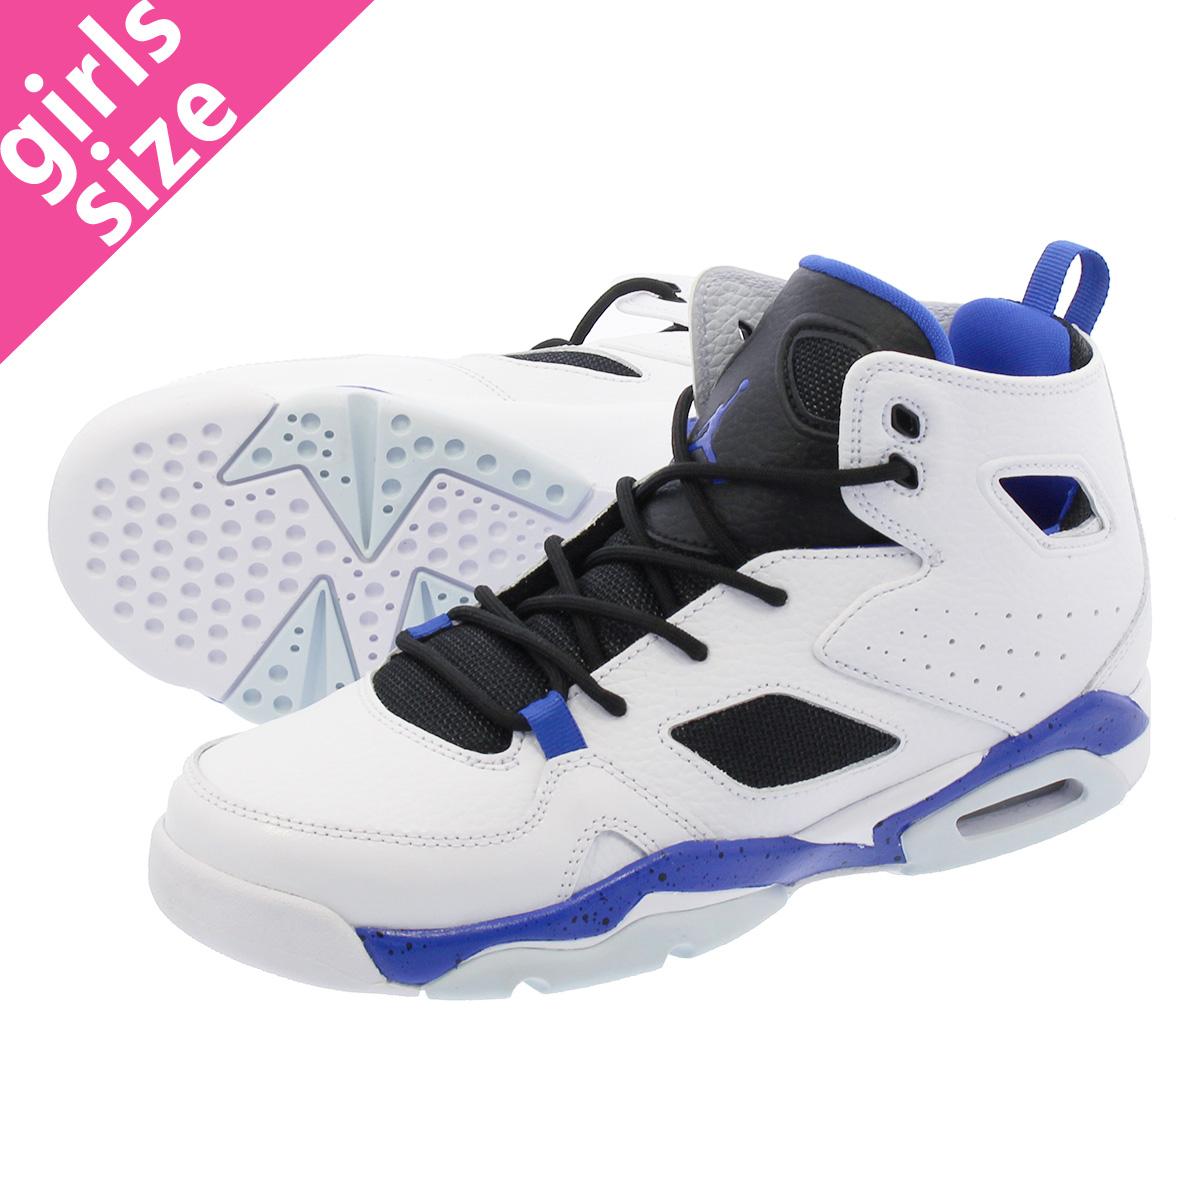 6c29471c383ff9 NIKE JORDAN FLIGHT CLUB 91 BG Nike Jordan flight club 91 BG WHITE HYPER  ROYAL BLACK 555